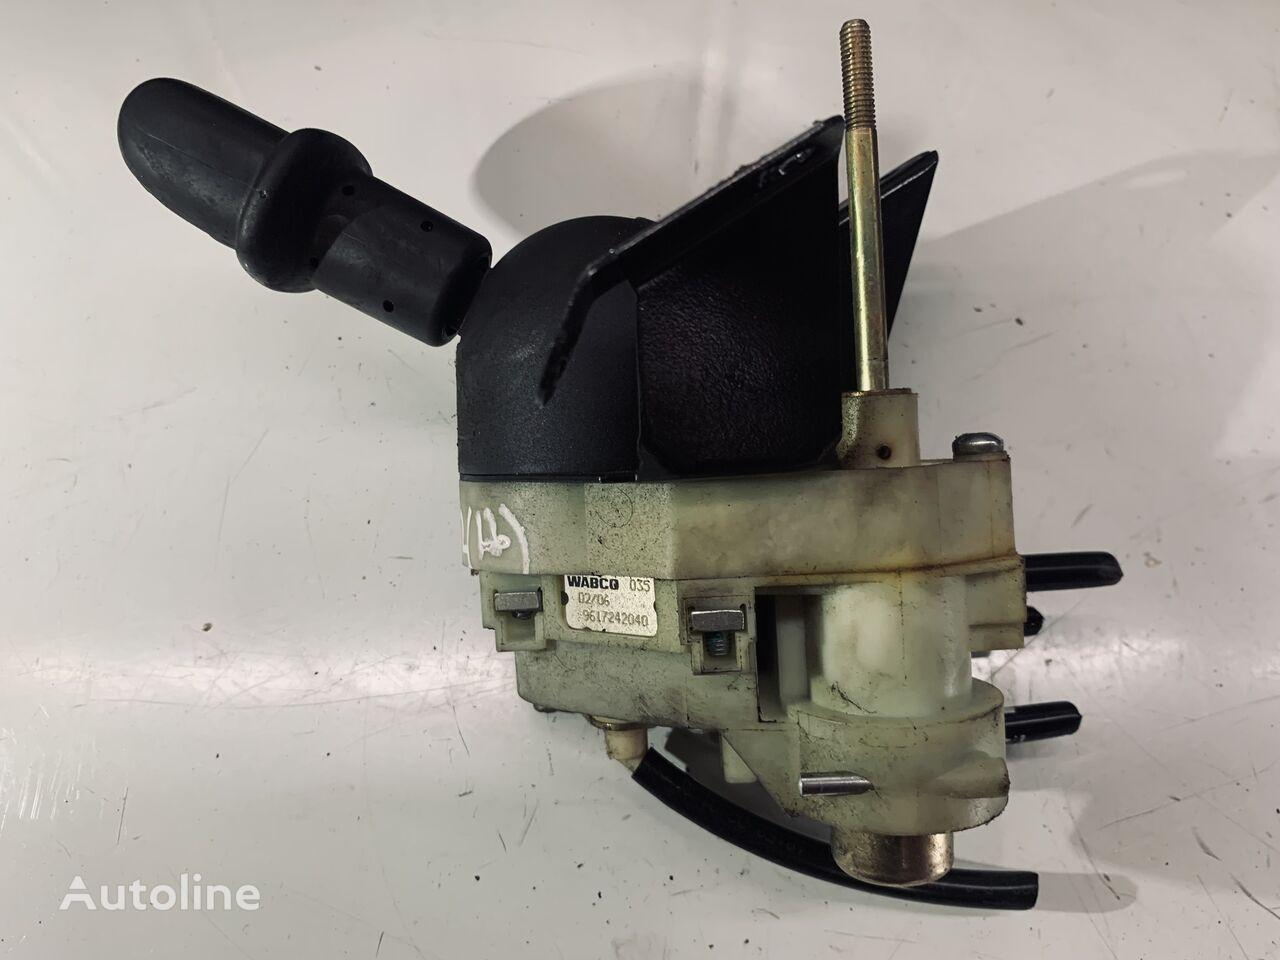 WABCO (9617242040) hand brake valve for VOLVO tractor unit